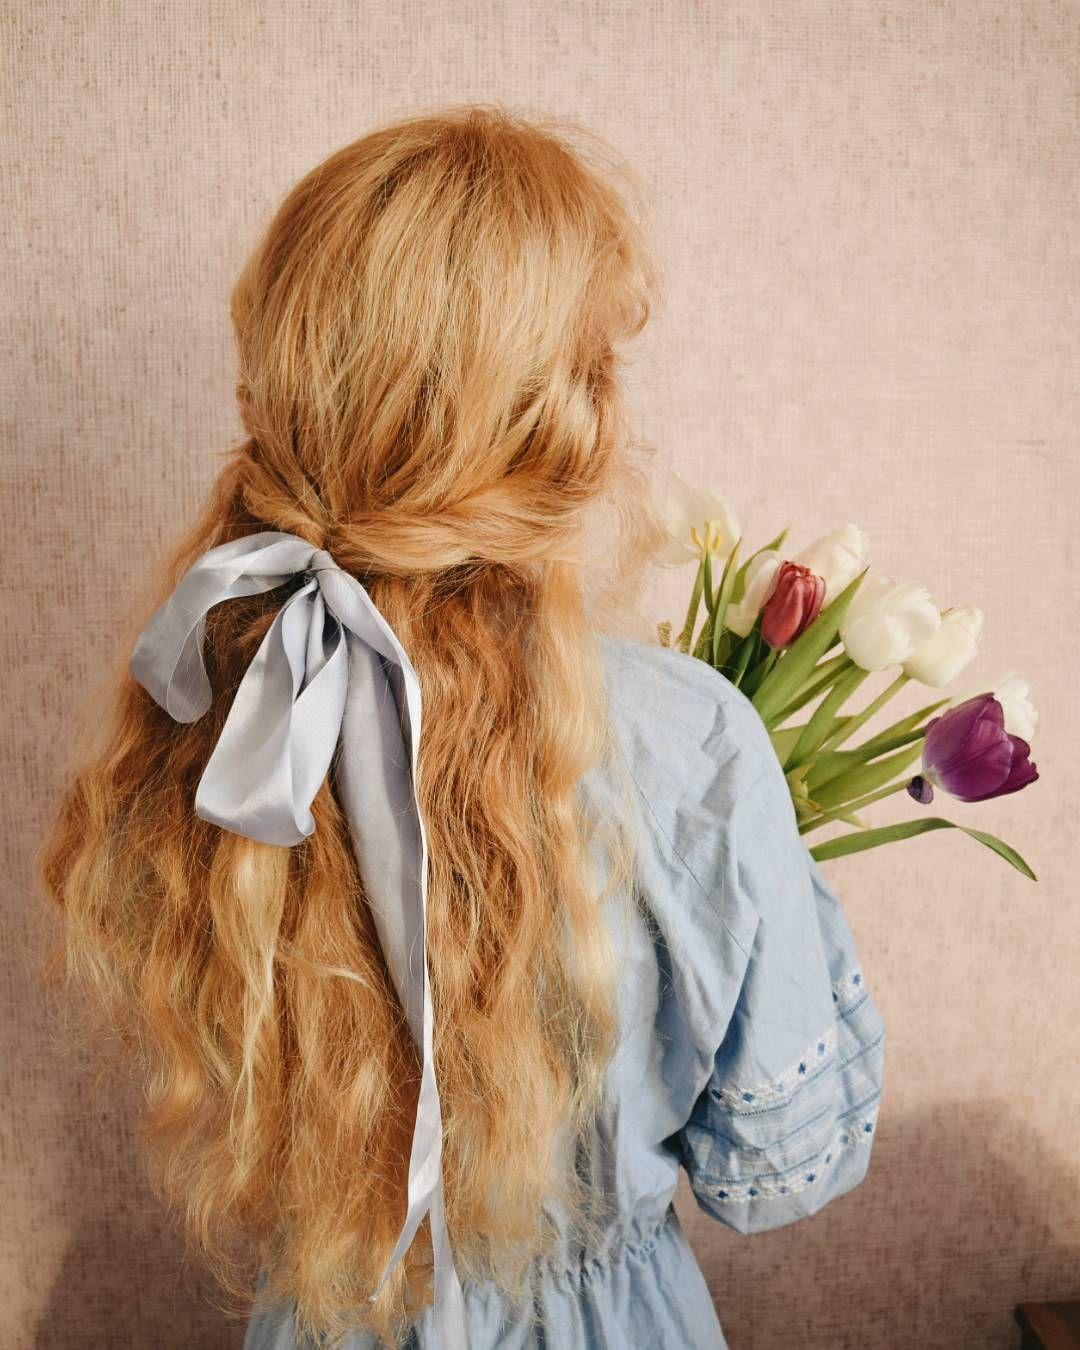 Desert Rose Moon in 2020 Hair ribbons, Hair styles